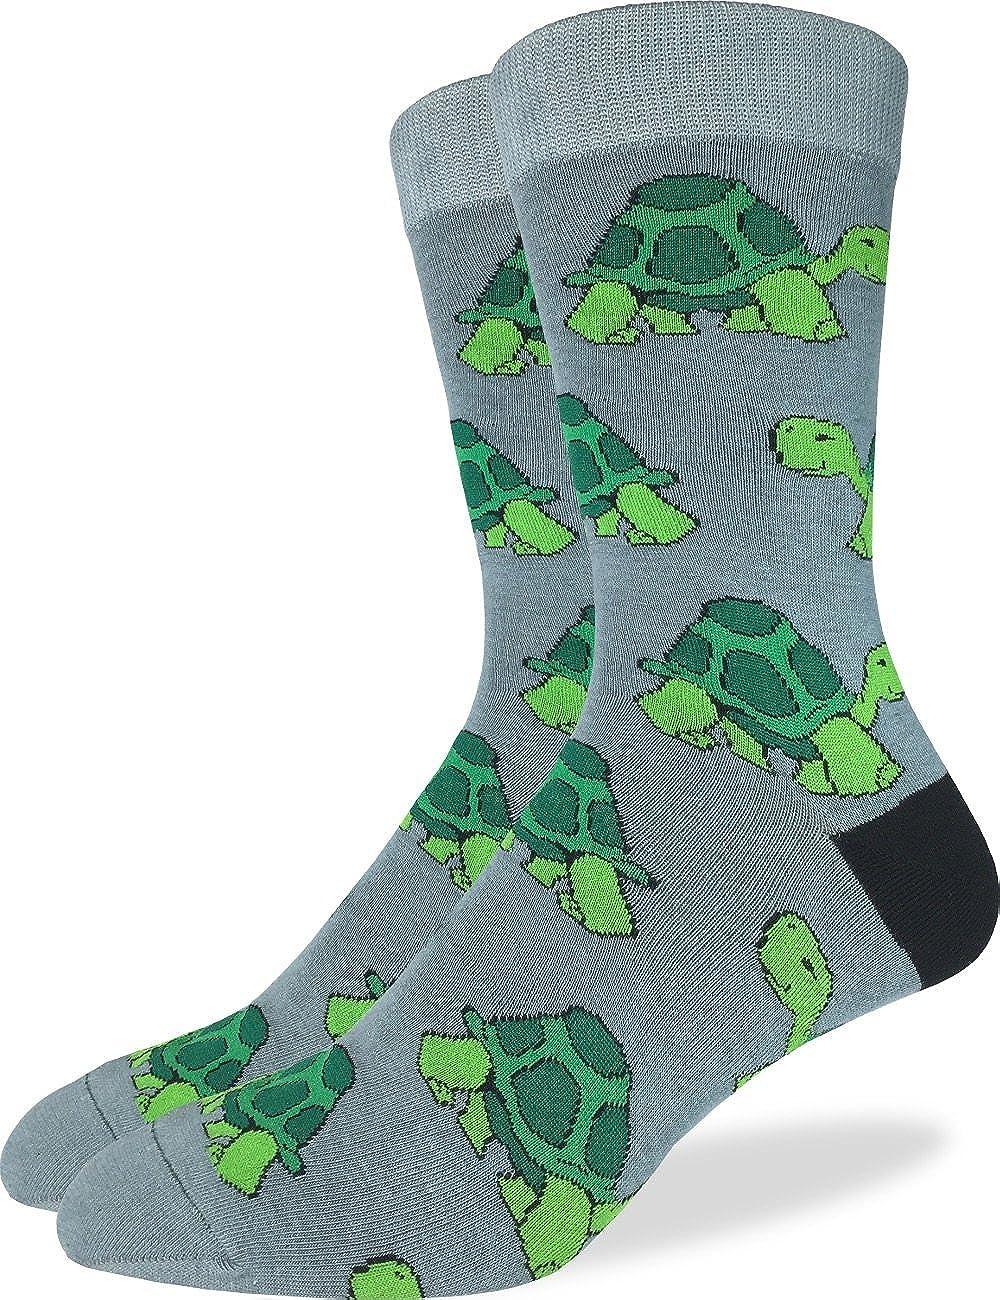 2. Men's Turtle Crew Socks